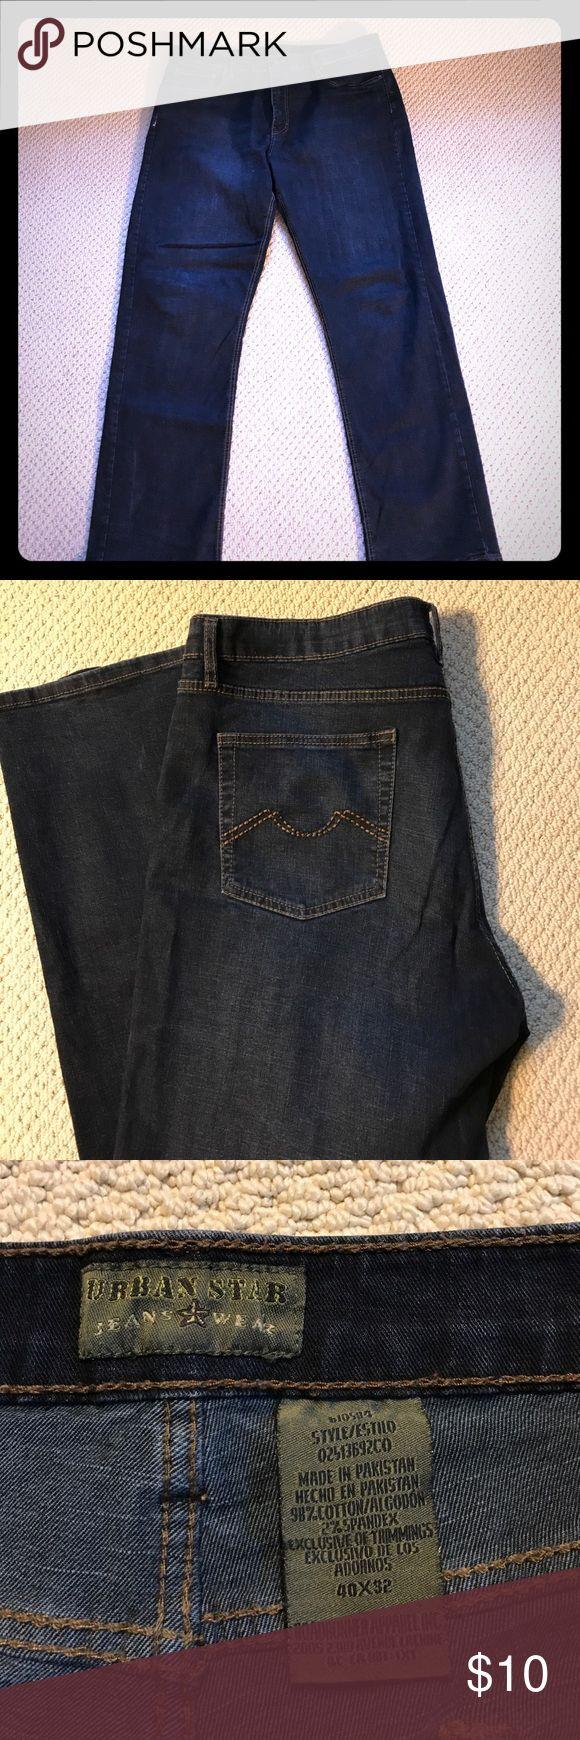 Men's jeans. Men's Urban Star dark jeans. Size 40x32. Urban Star Jeans Straight